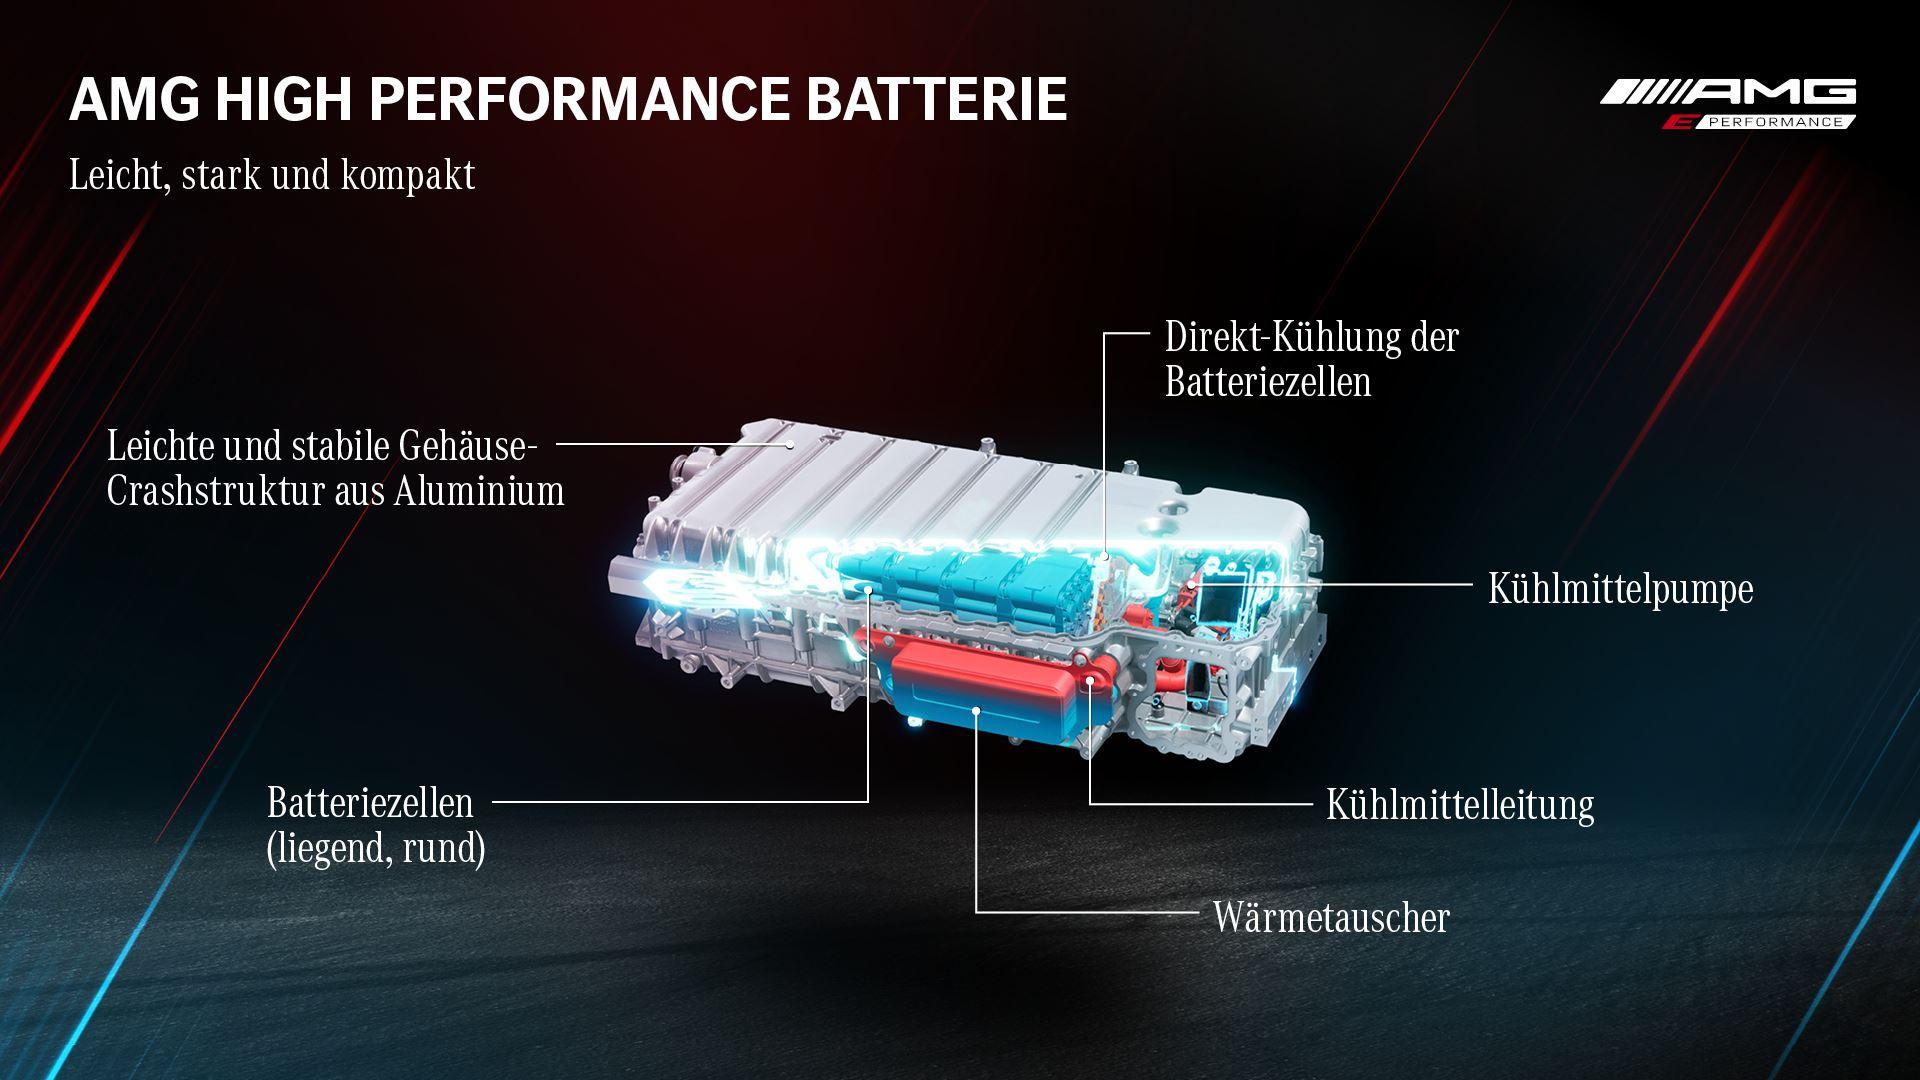 AMG High-Performance Batterie